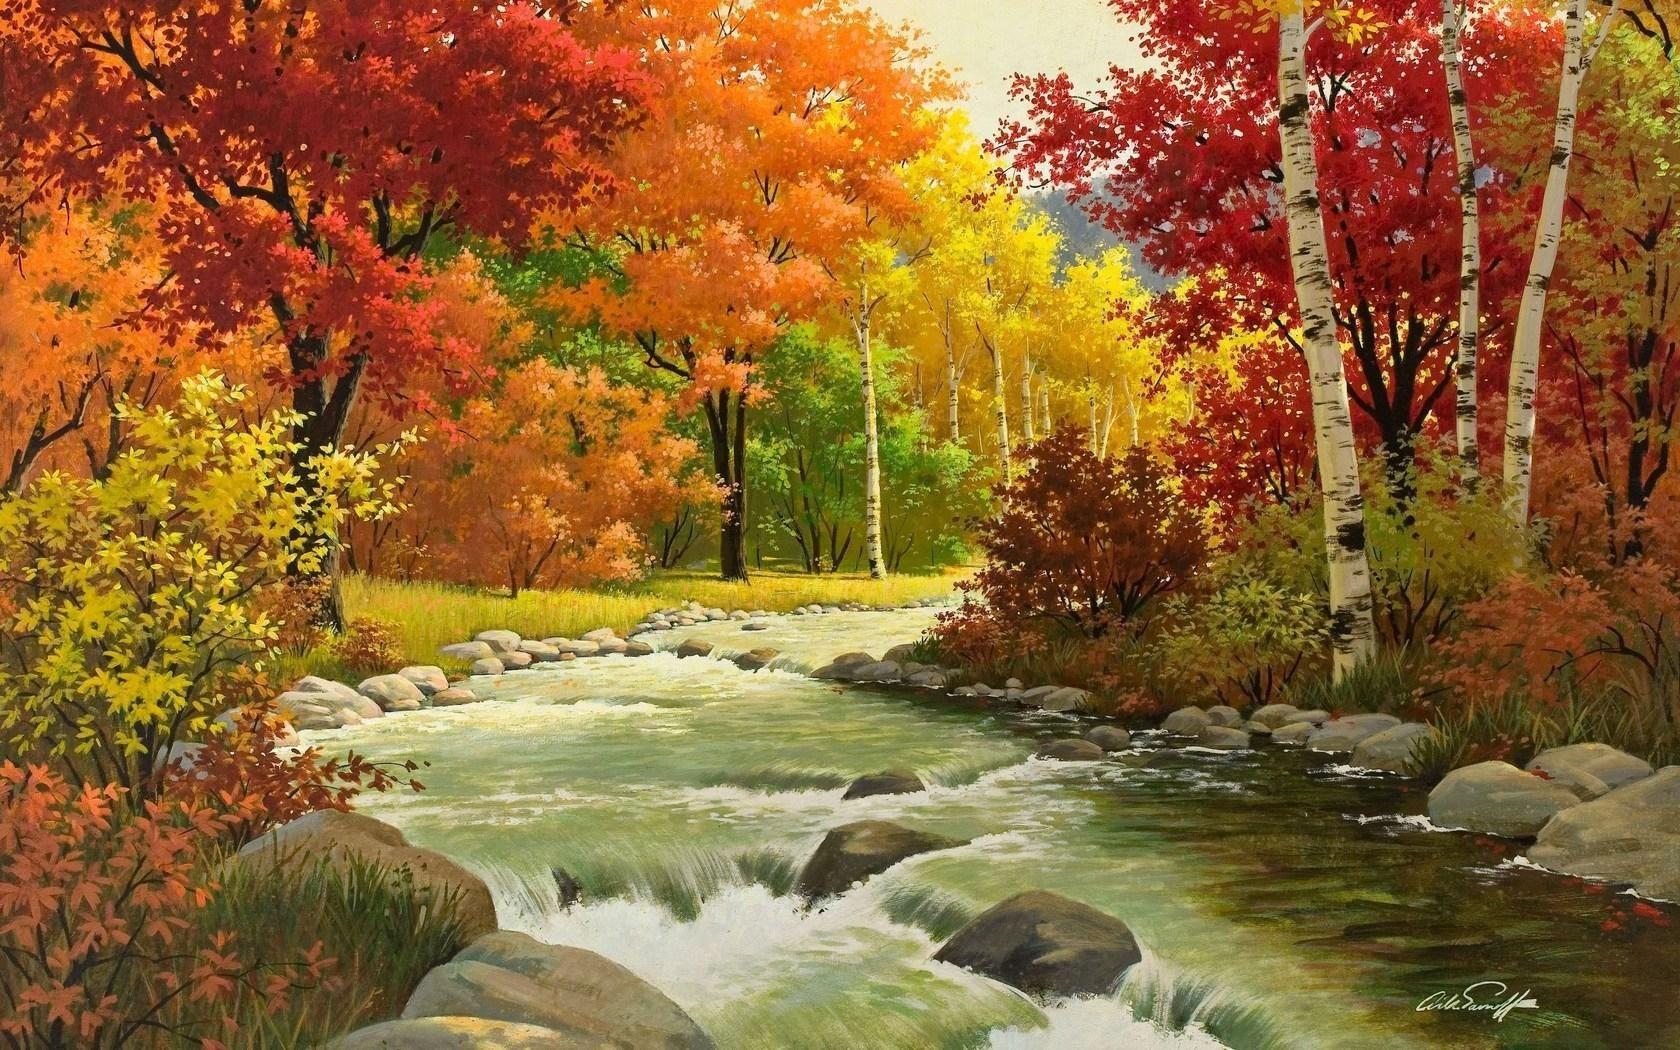 Musim Gugur Pemandangan Lukisan Sungai Kayu Diany